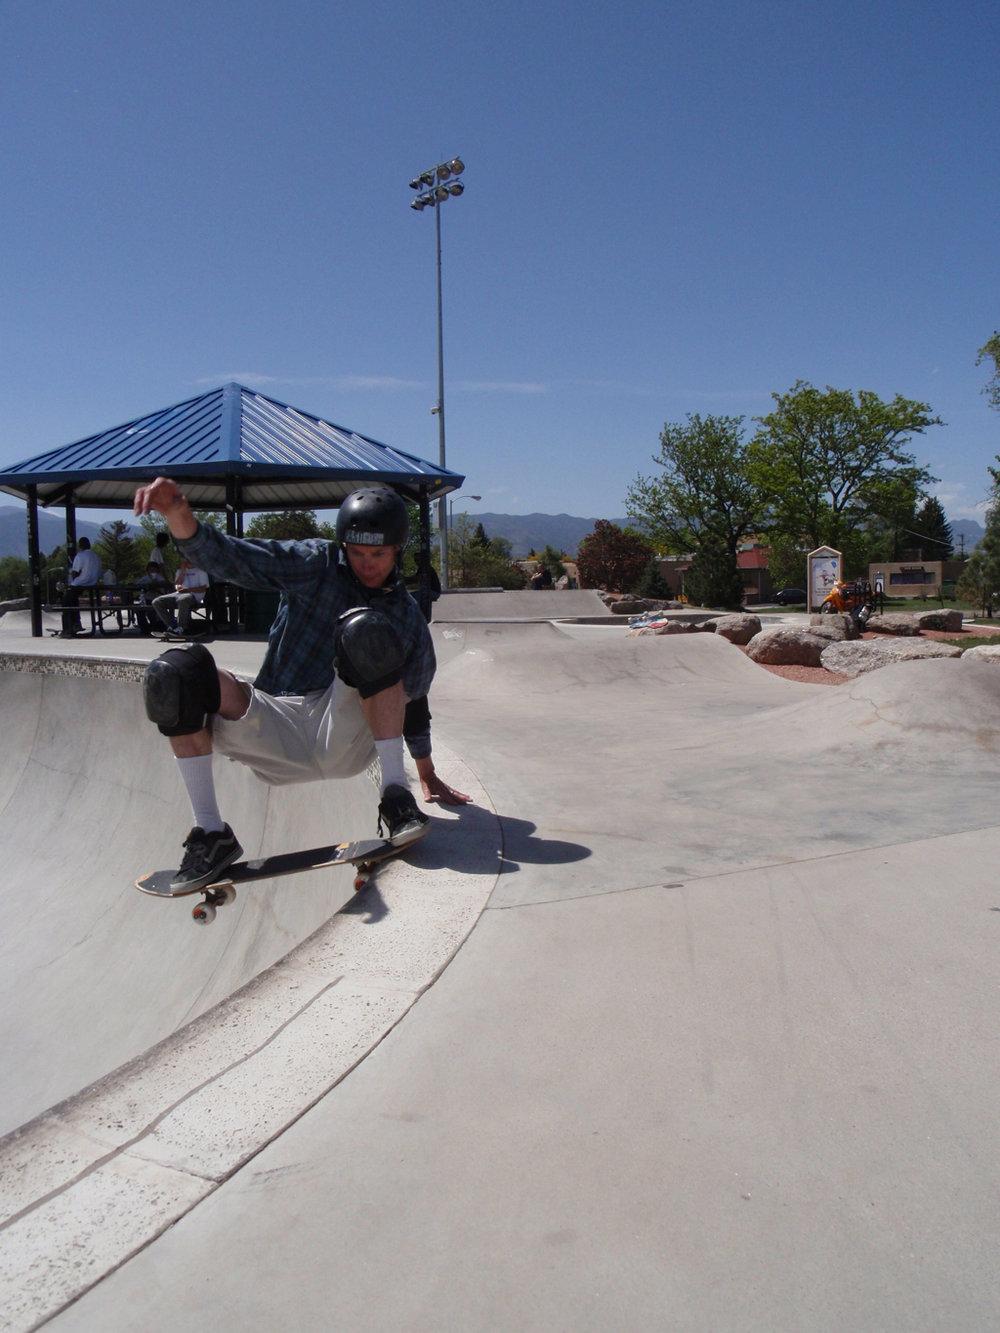 Lance ripping at Memorial Skatepark in Colorado Springs